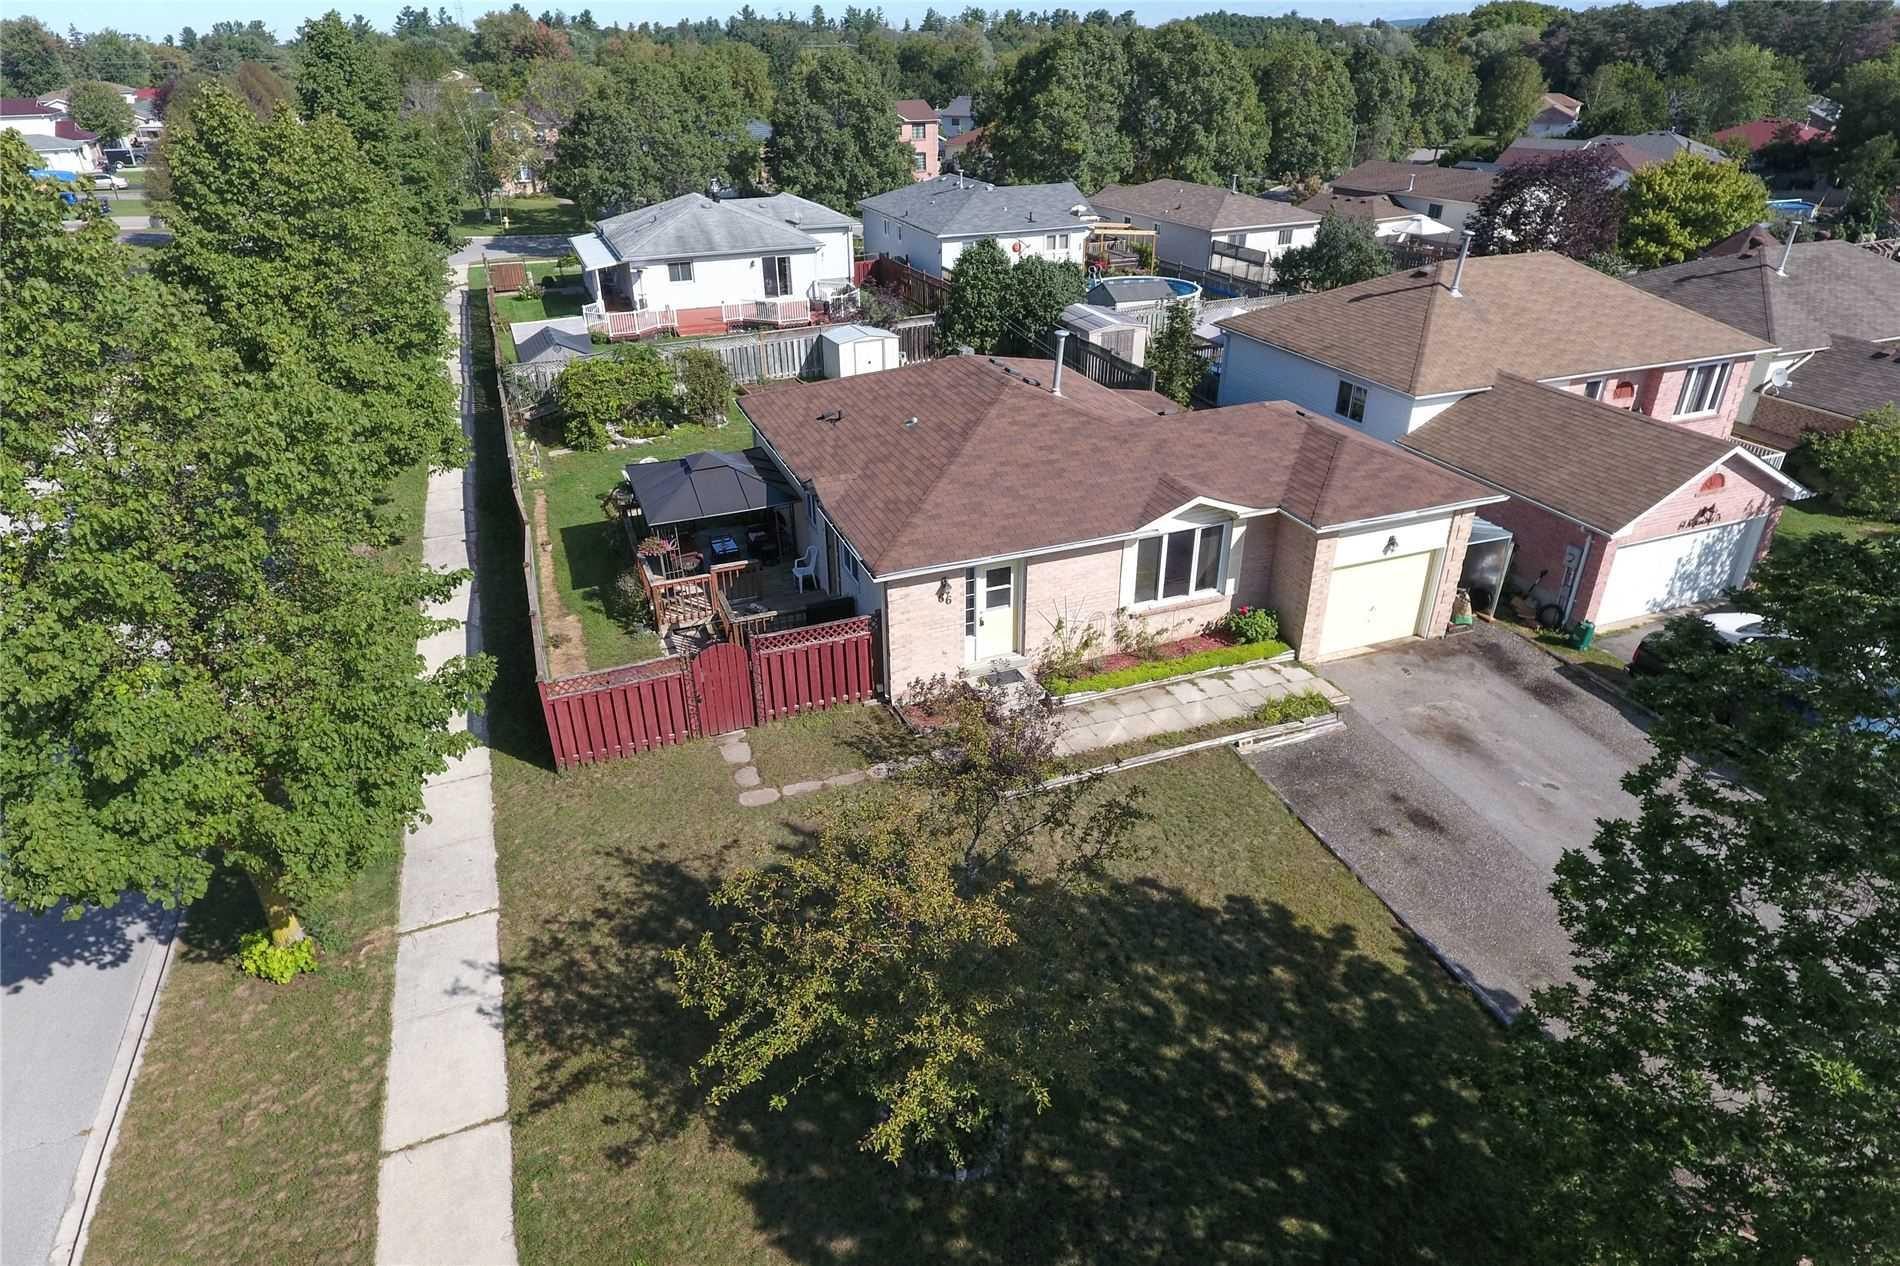 Detached house For Sale In Essa - 66 Nottawasaga Dr, Essa, Ontario, Canada L0M1B0 , 3 Bedrooms Bedrooms, ,2 BathroomsBathrooms,Detached,For Sale,Nottawasaga